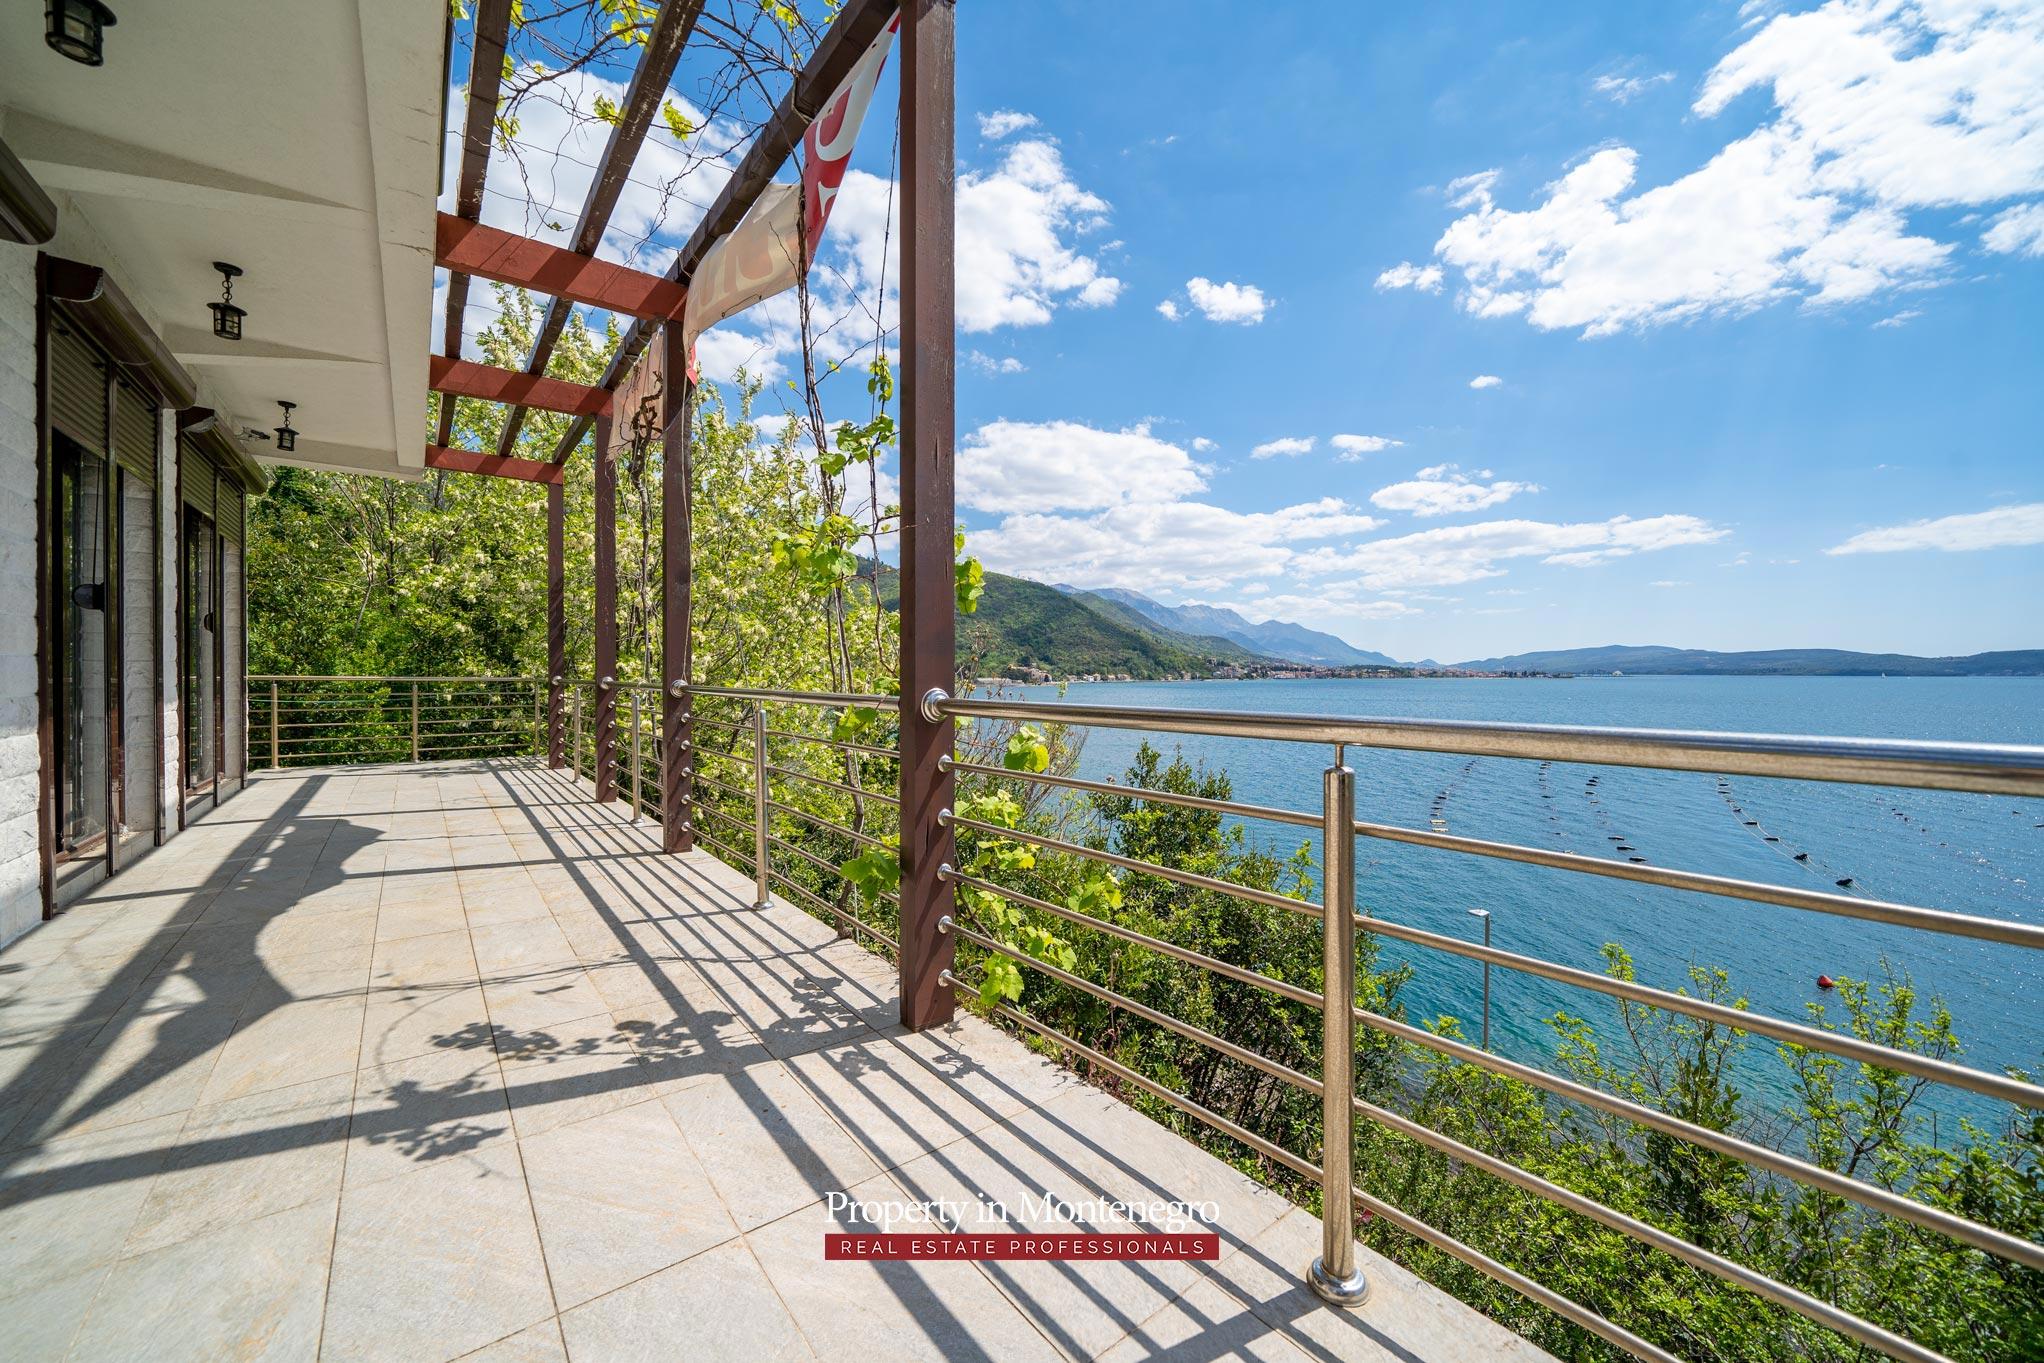 House for sale in Herceg Novi